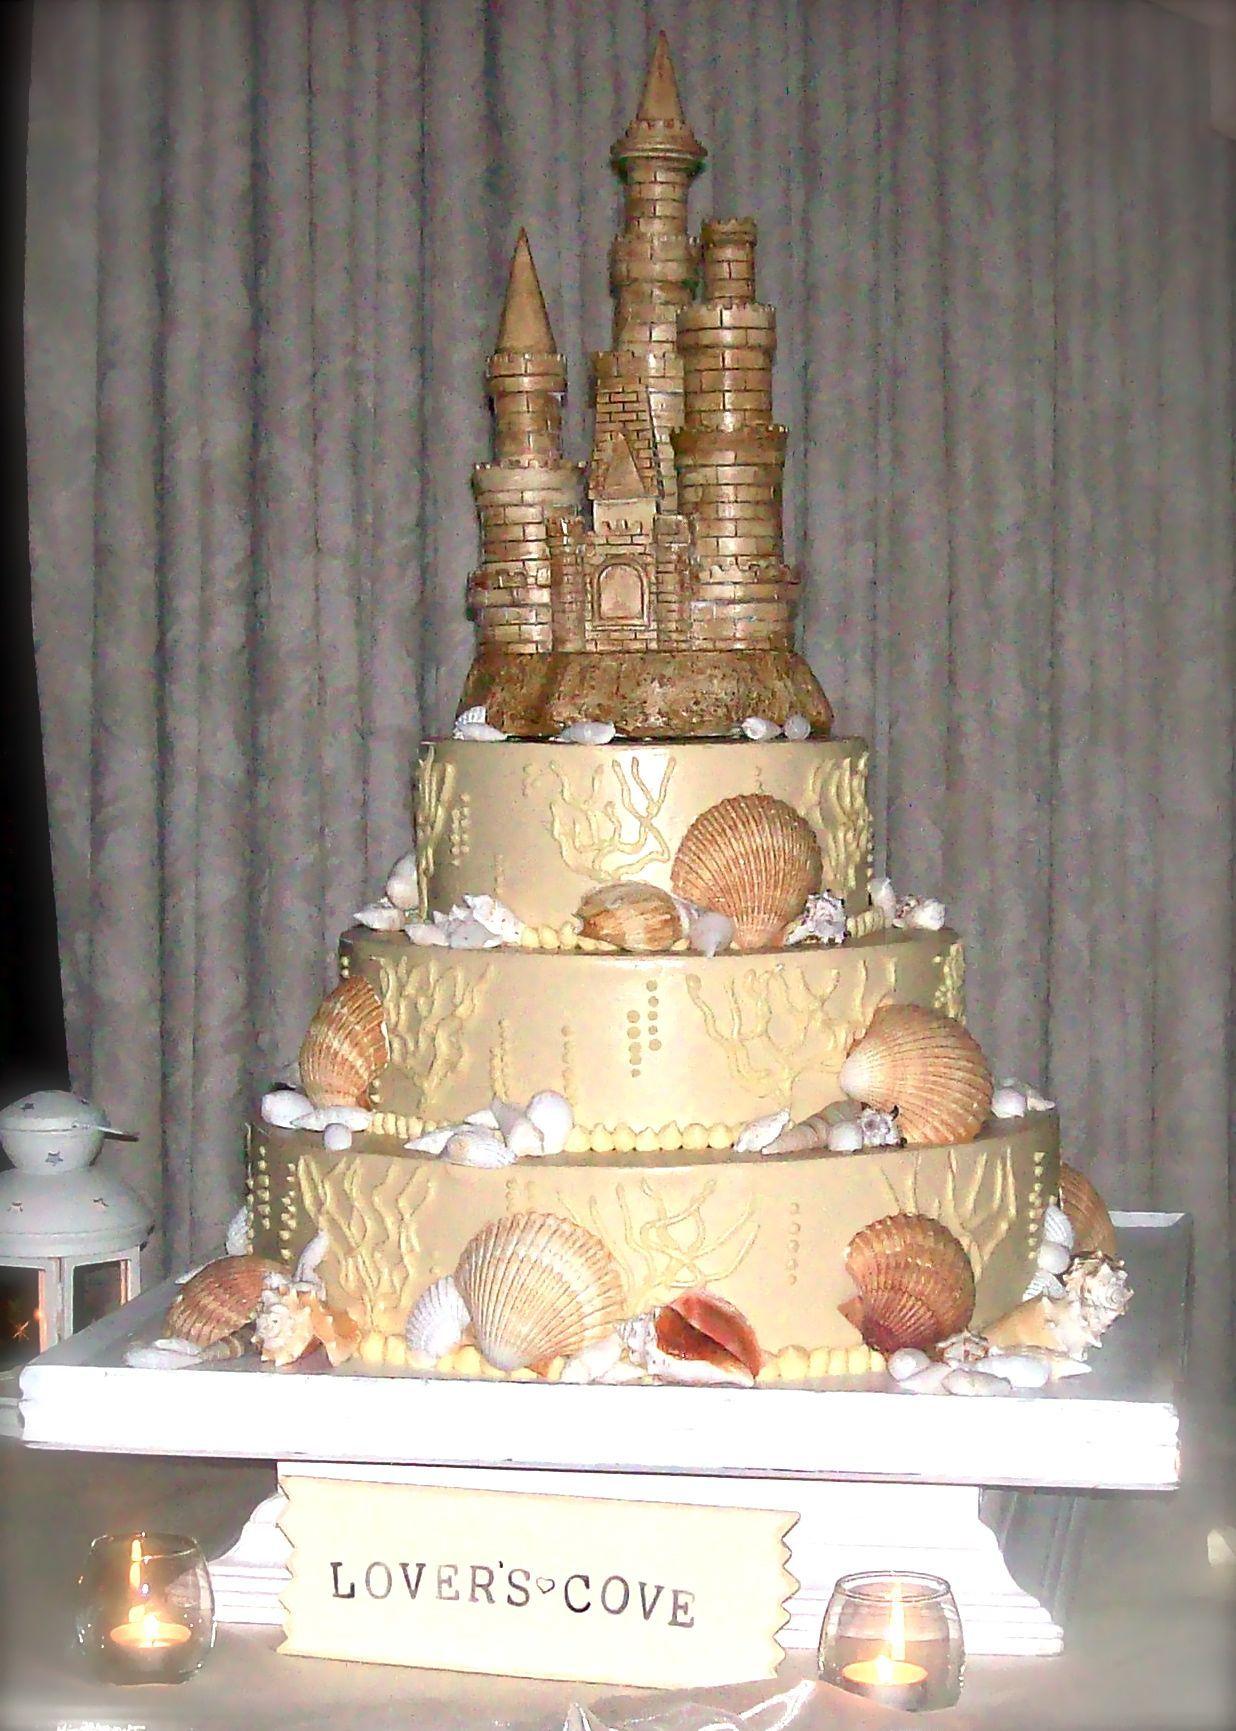 wedding cakes in lagunbeach ca%0A My Sand Castle wedding cake by Savoie u    s Fare  Orange County  Beach Wedding   Laguna